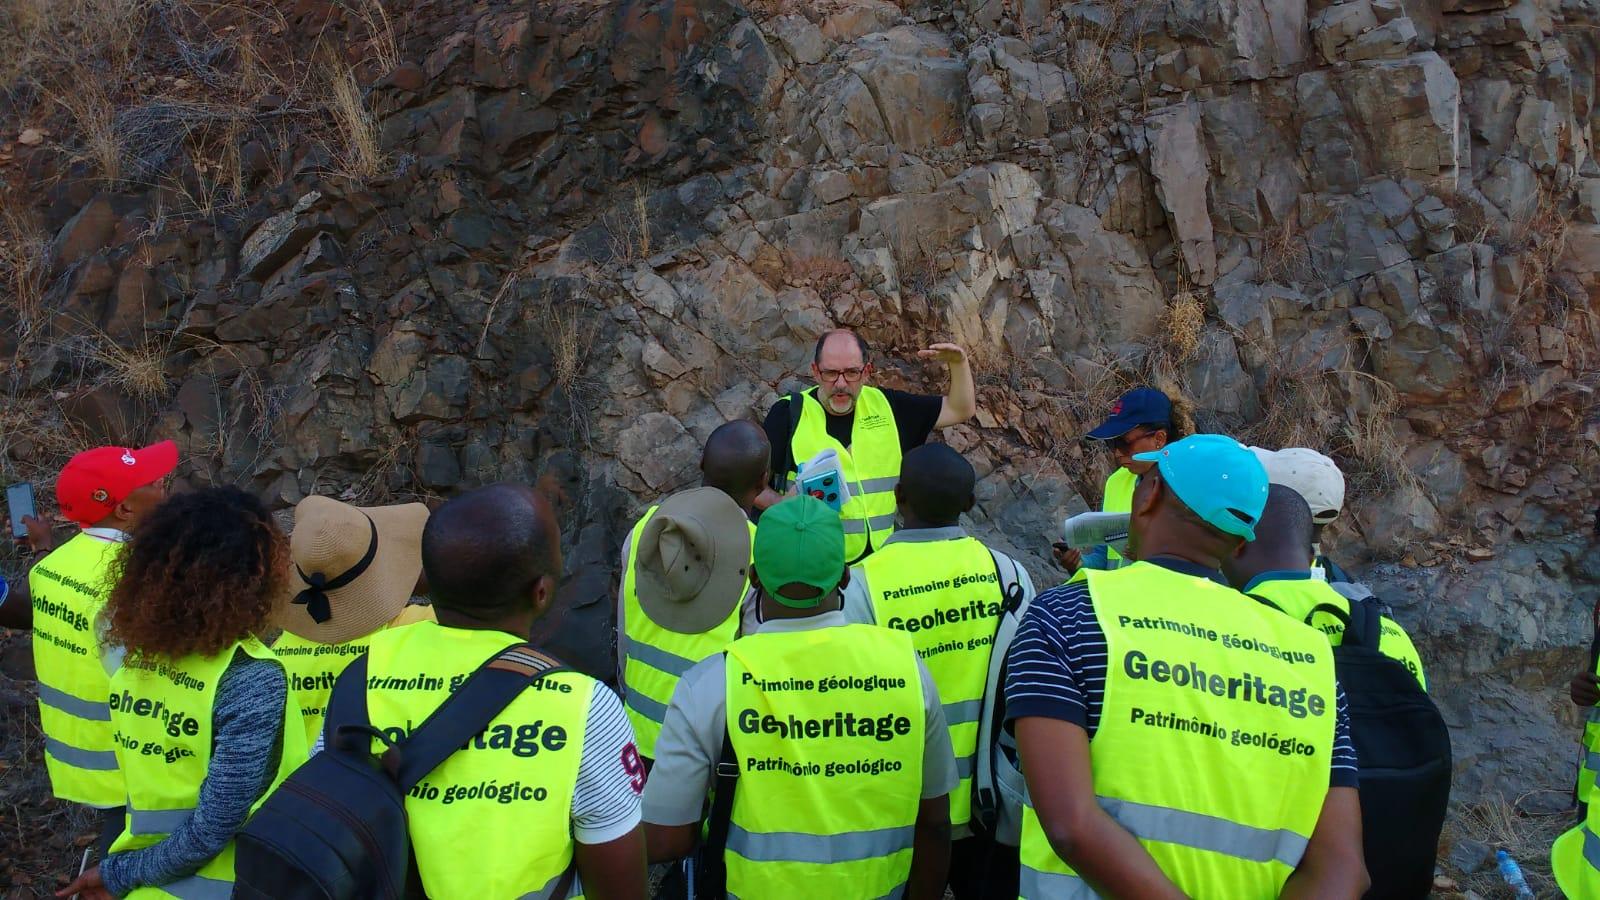 Pat Geológico PanAfGeo MZ 2019 (1)